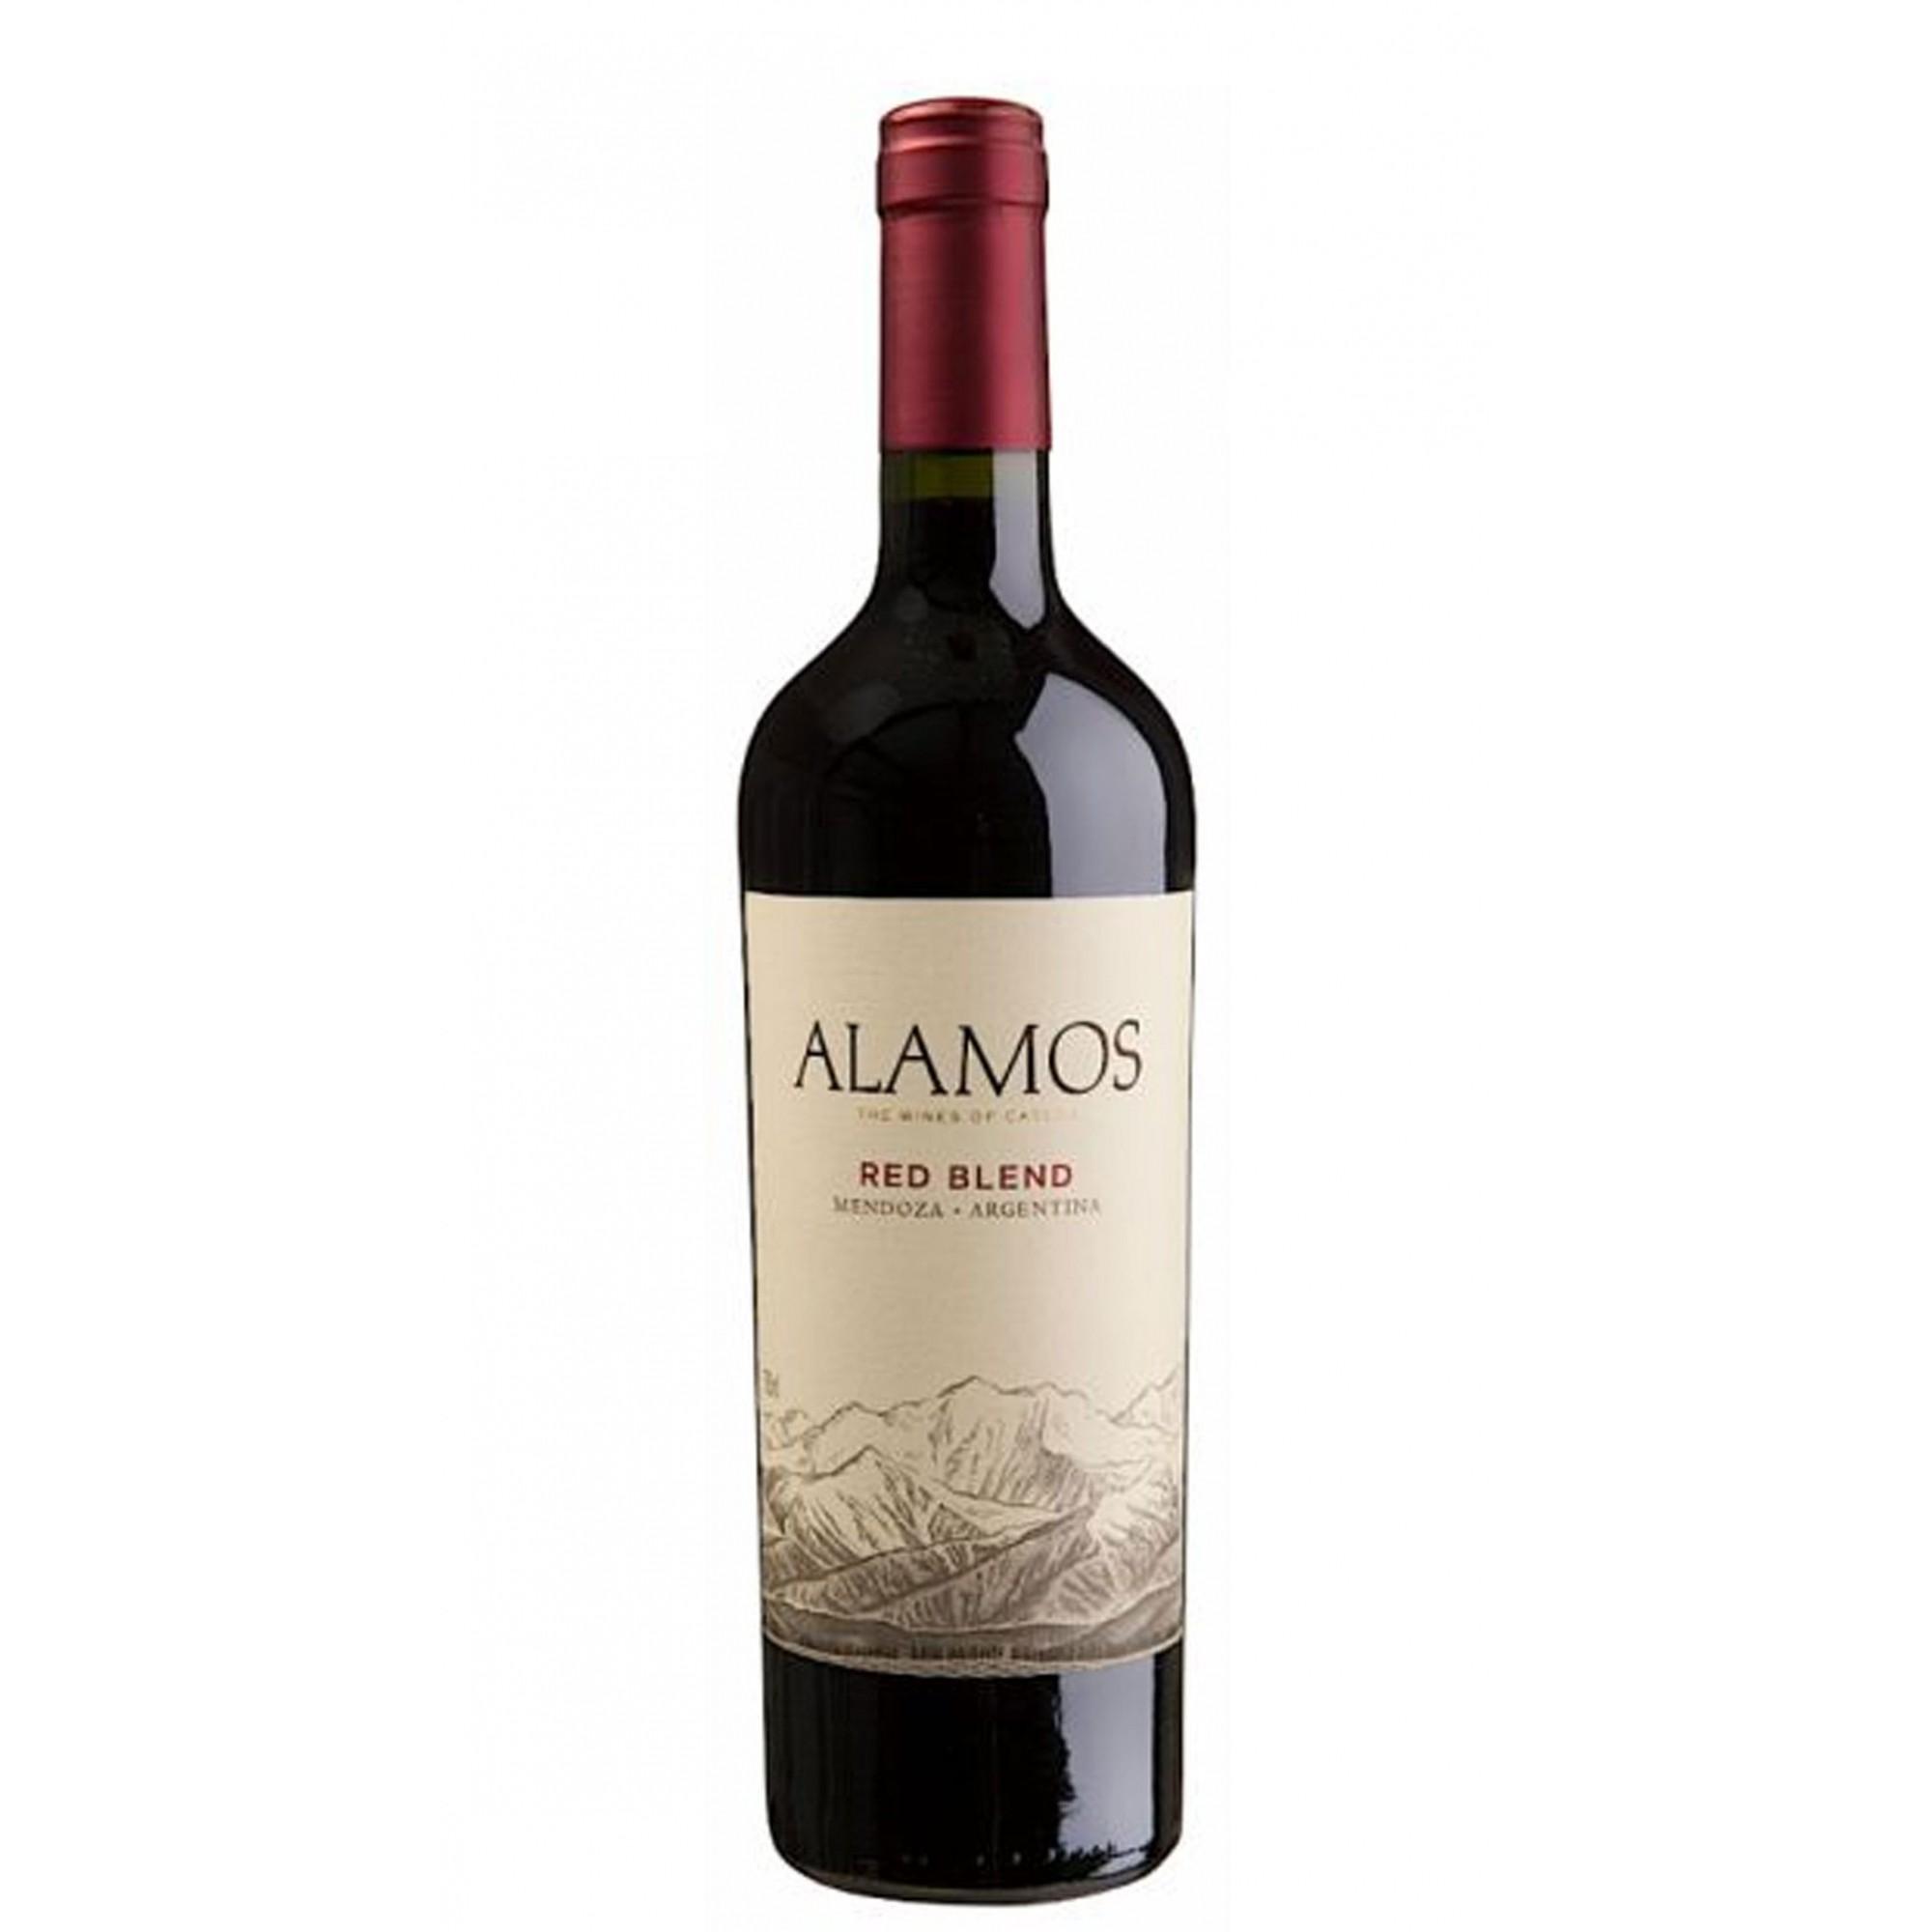 Vinho Alamos Red Blend 2018 Tinto Argentina 750 ml